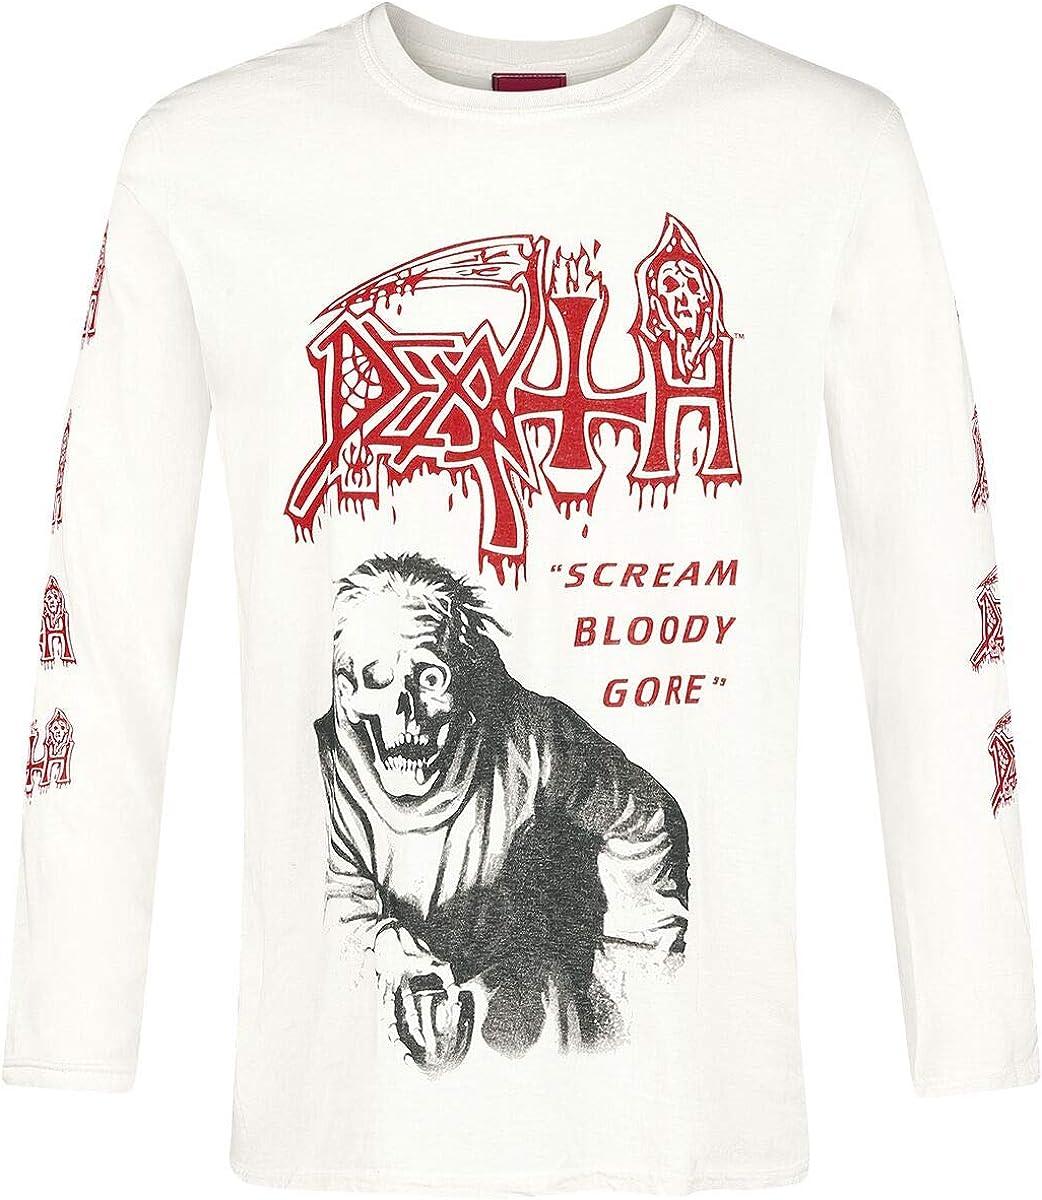 Death Scream Bloody Gore Hombre Camiseta Manga Larga Blanco Roto, Regular: Amazon.es: Ropa y accesorios